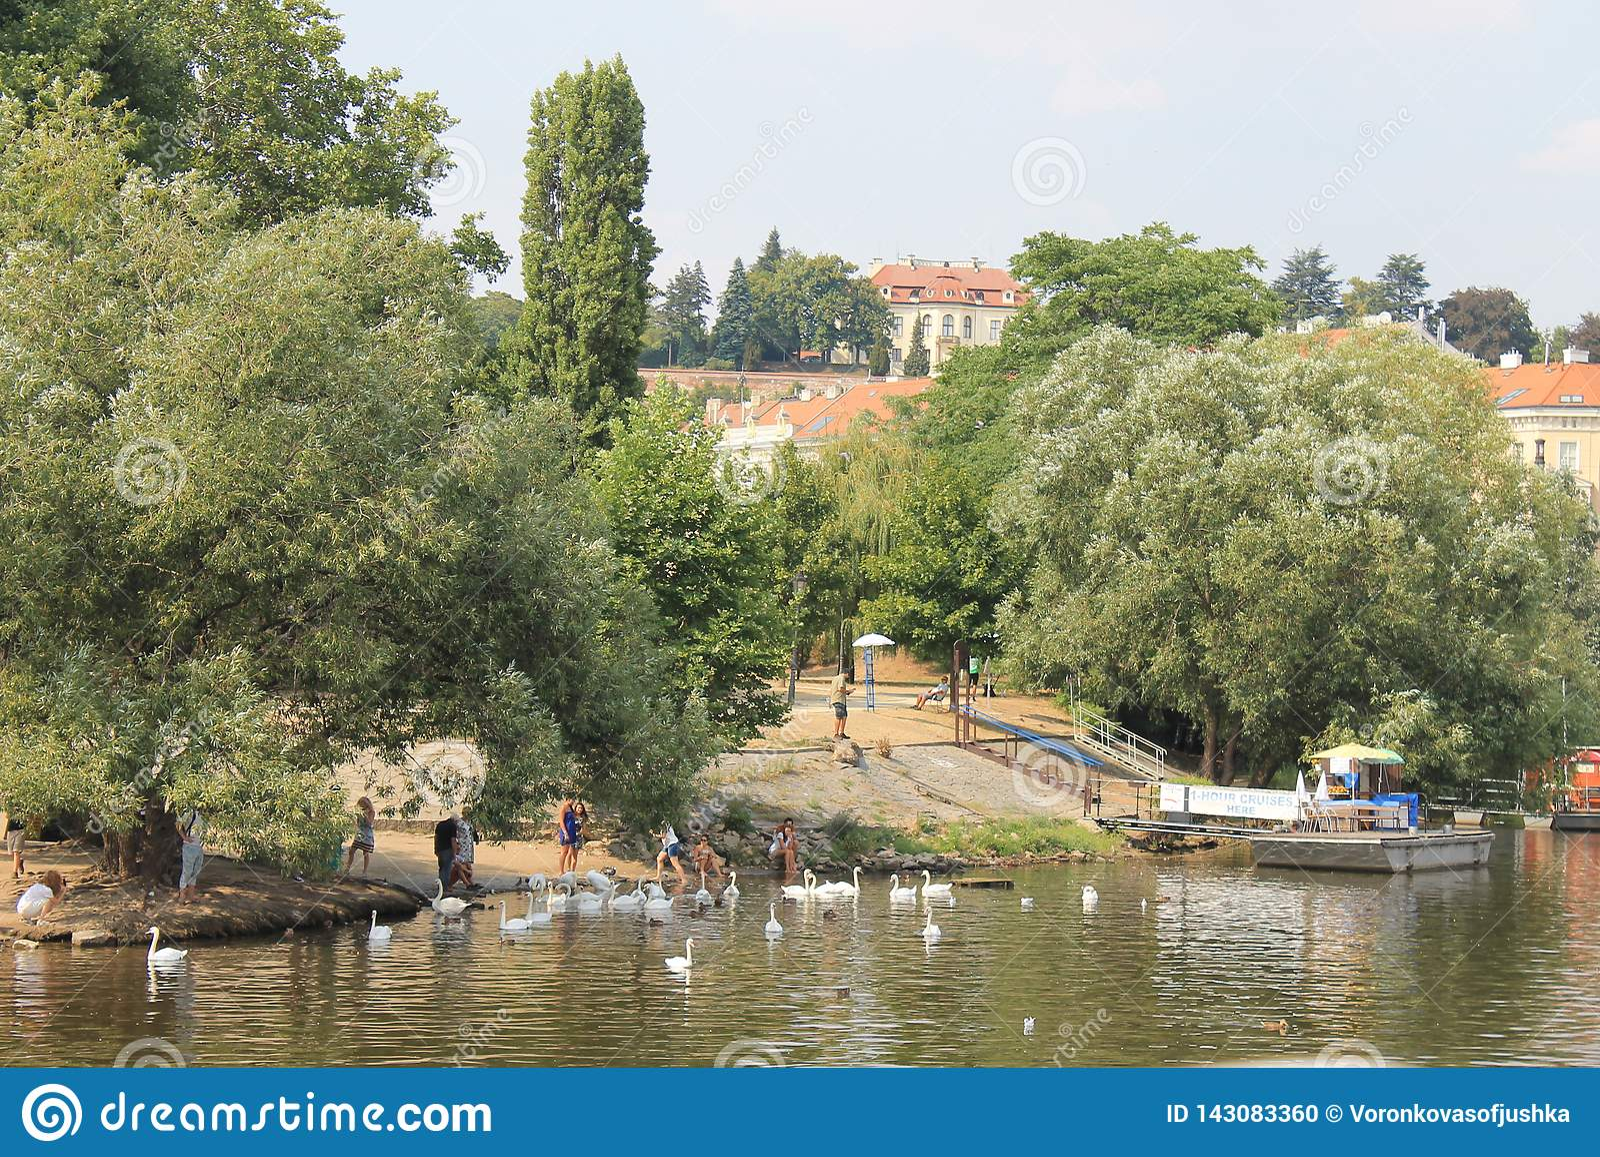 A flock of white swans on the Vltava river in Prague Czech Republic